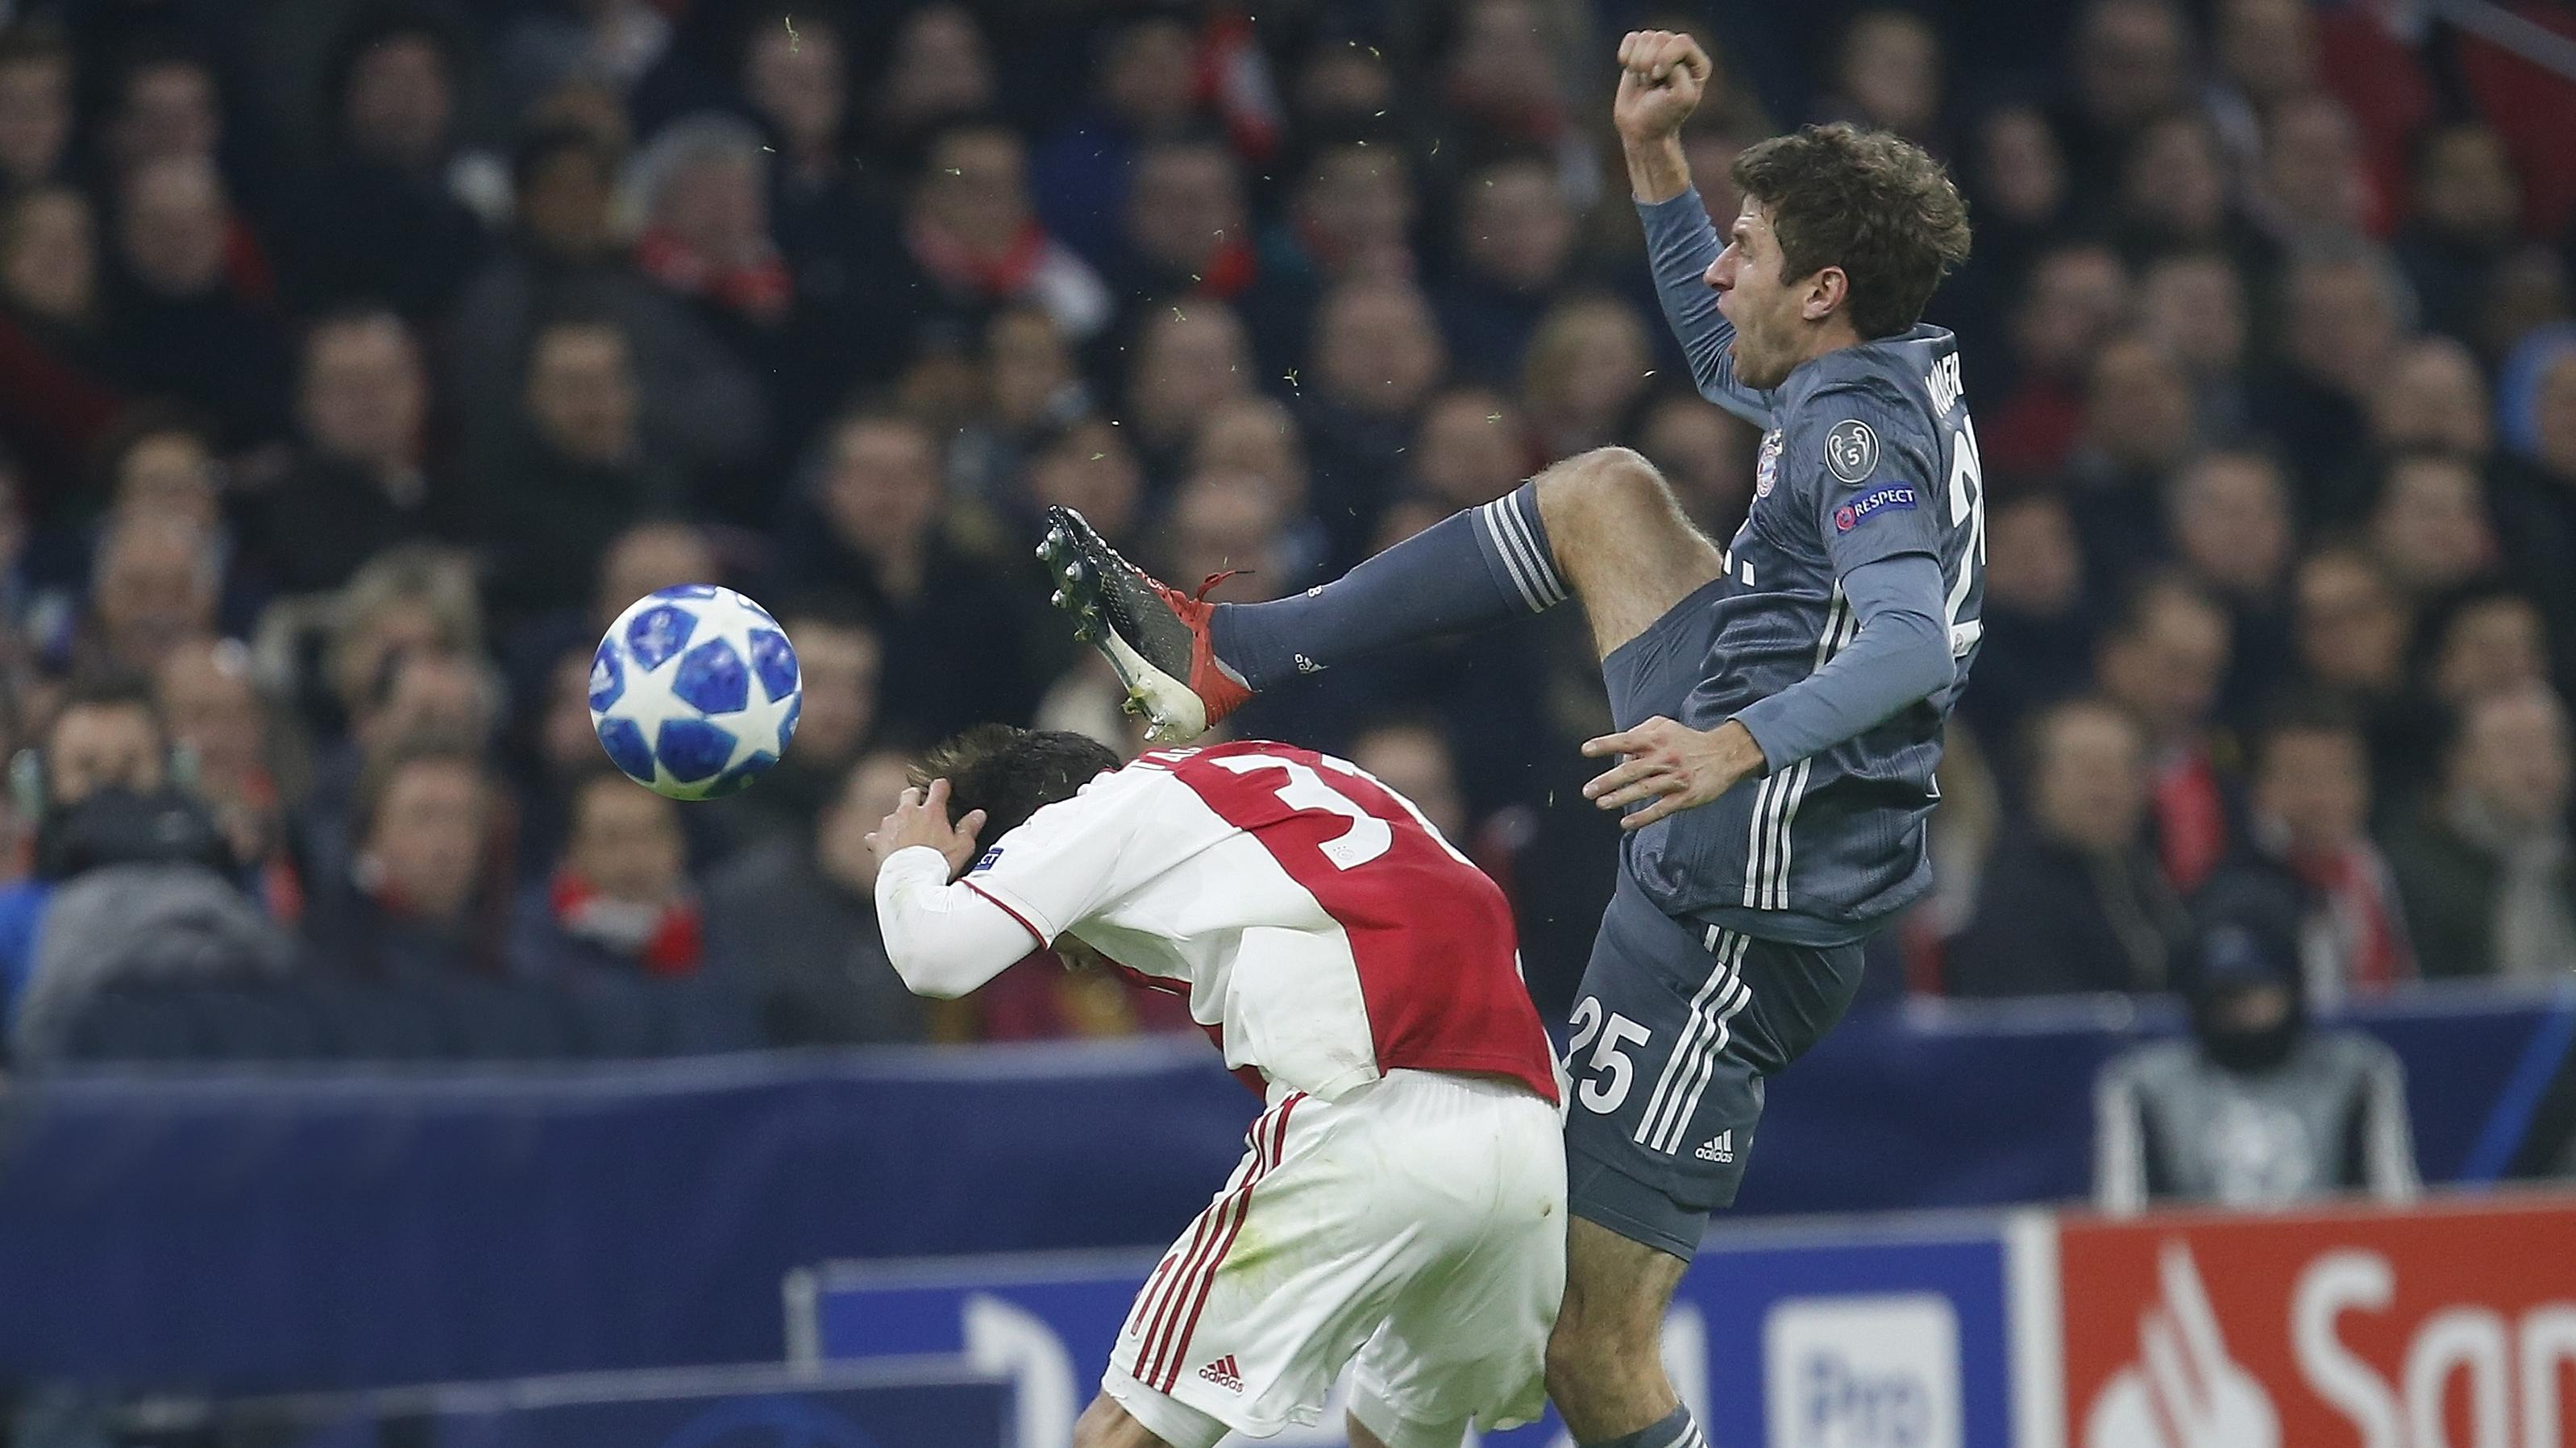 FC Bayern gegen Ajax Amsterdam: Thomas Müller sieht für sein Foul an Nicolas Tagliafico die Rote Karte.